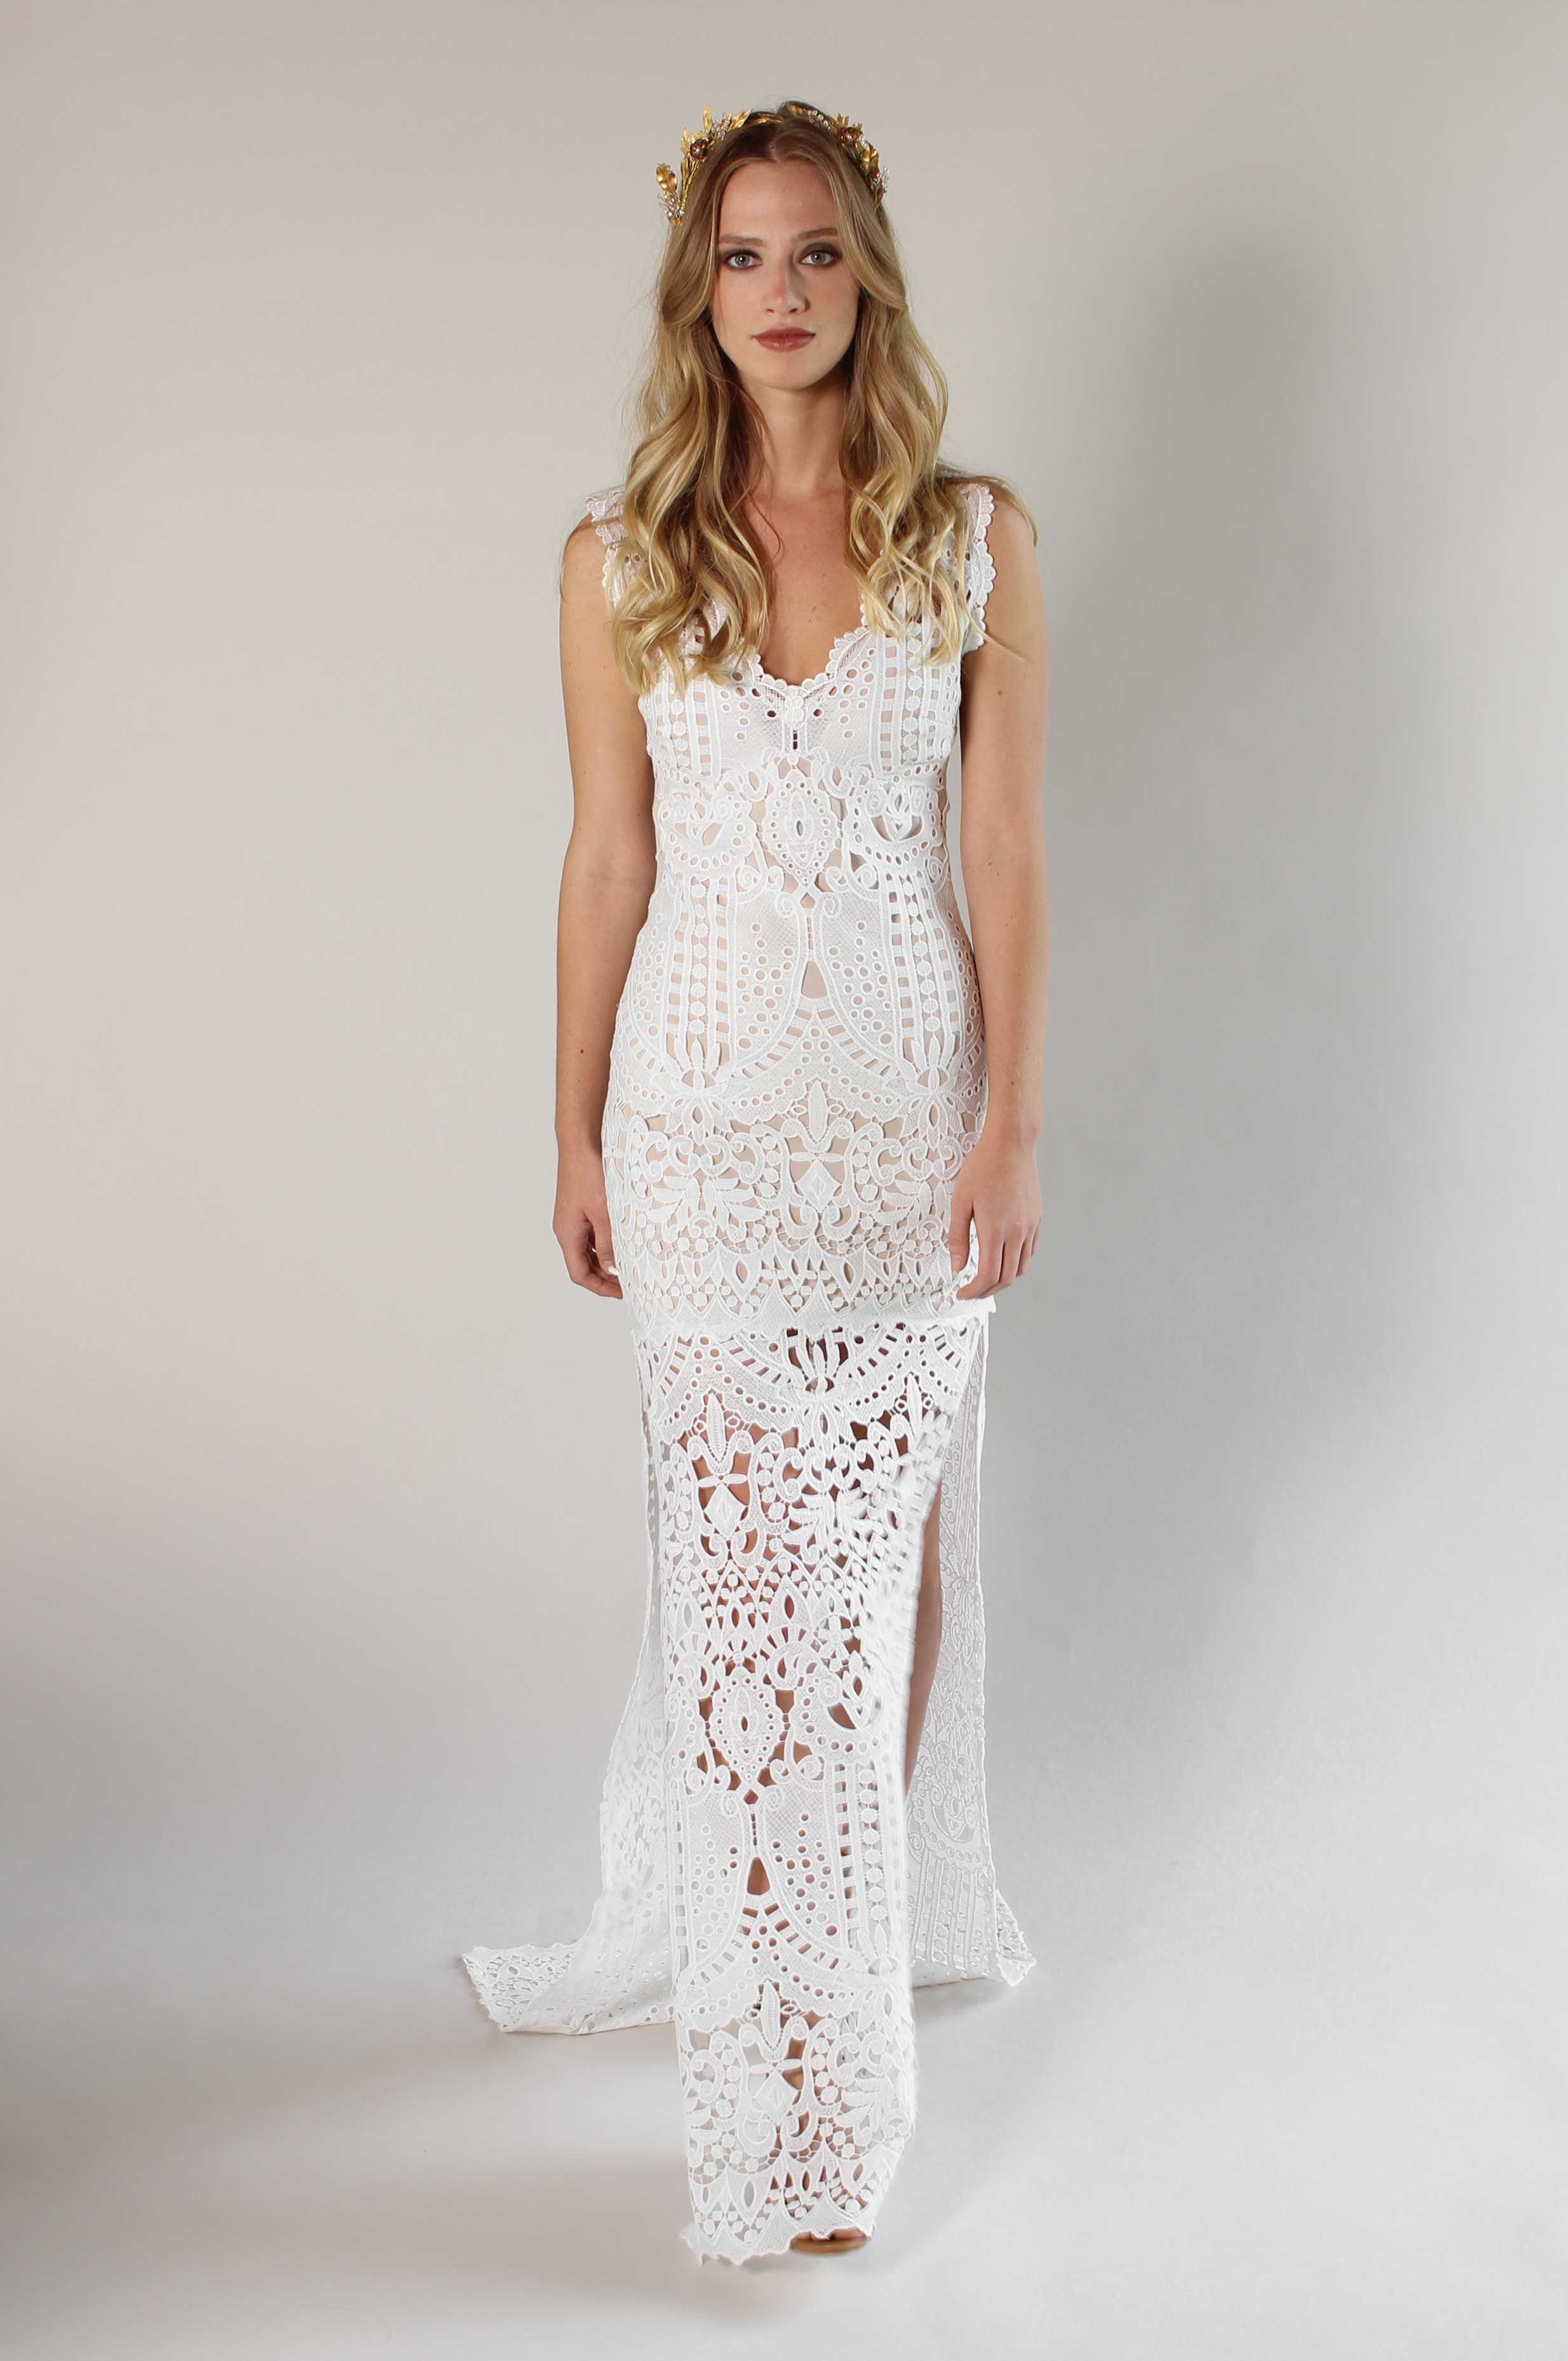 laguna Romantique by Claire Pettibone laser-cut wedding dress